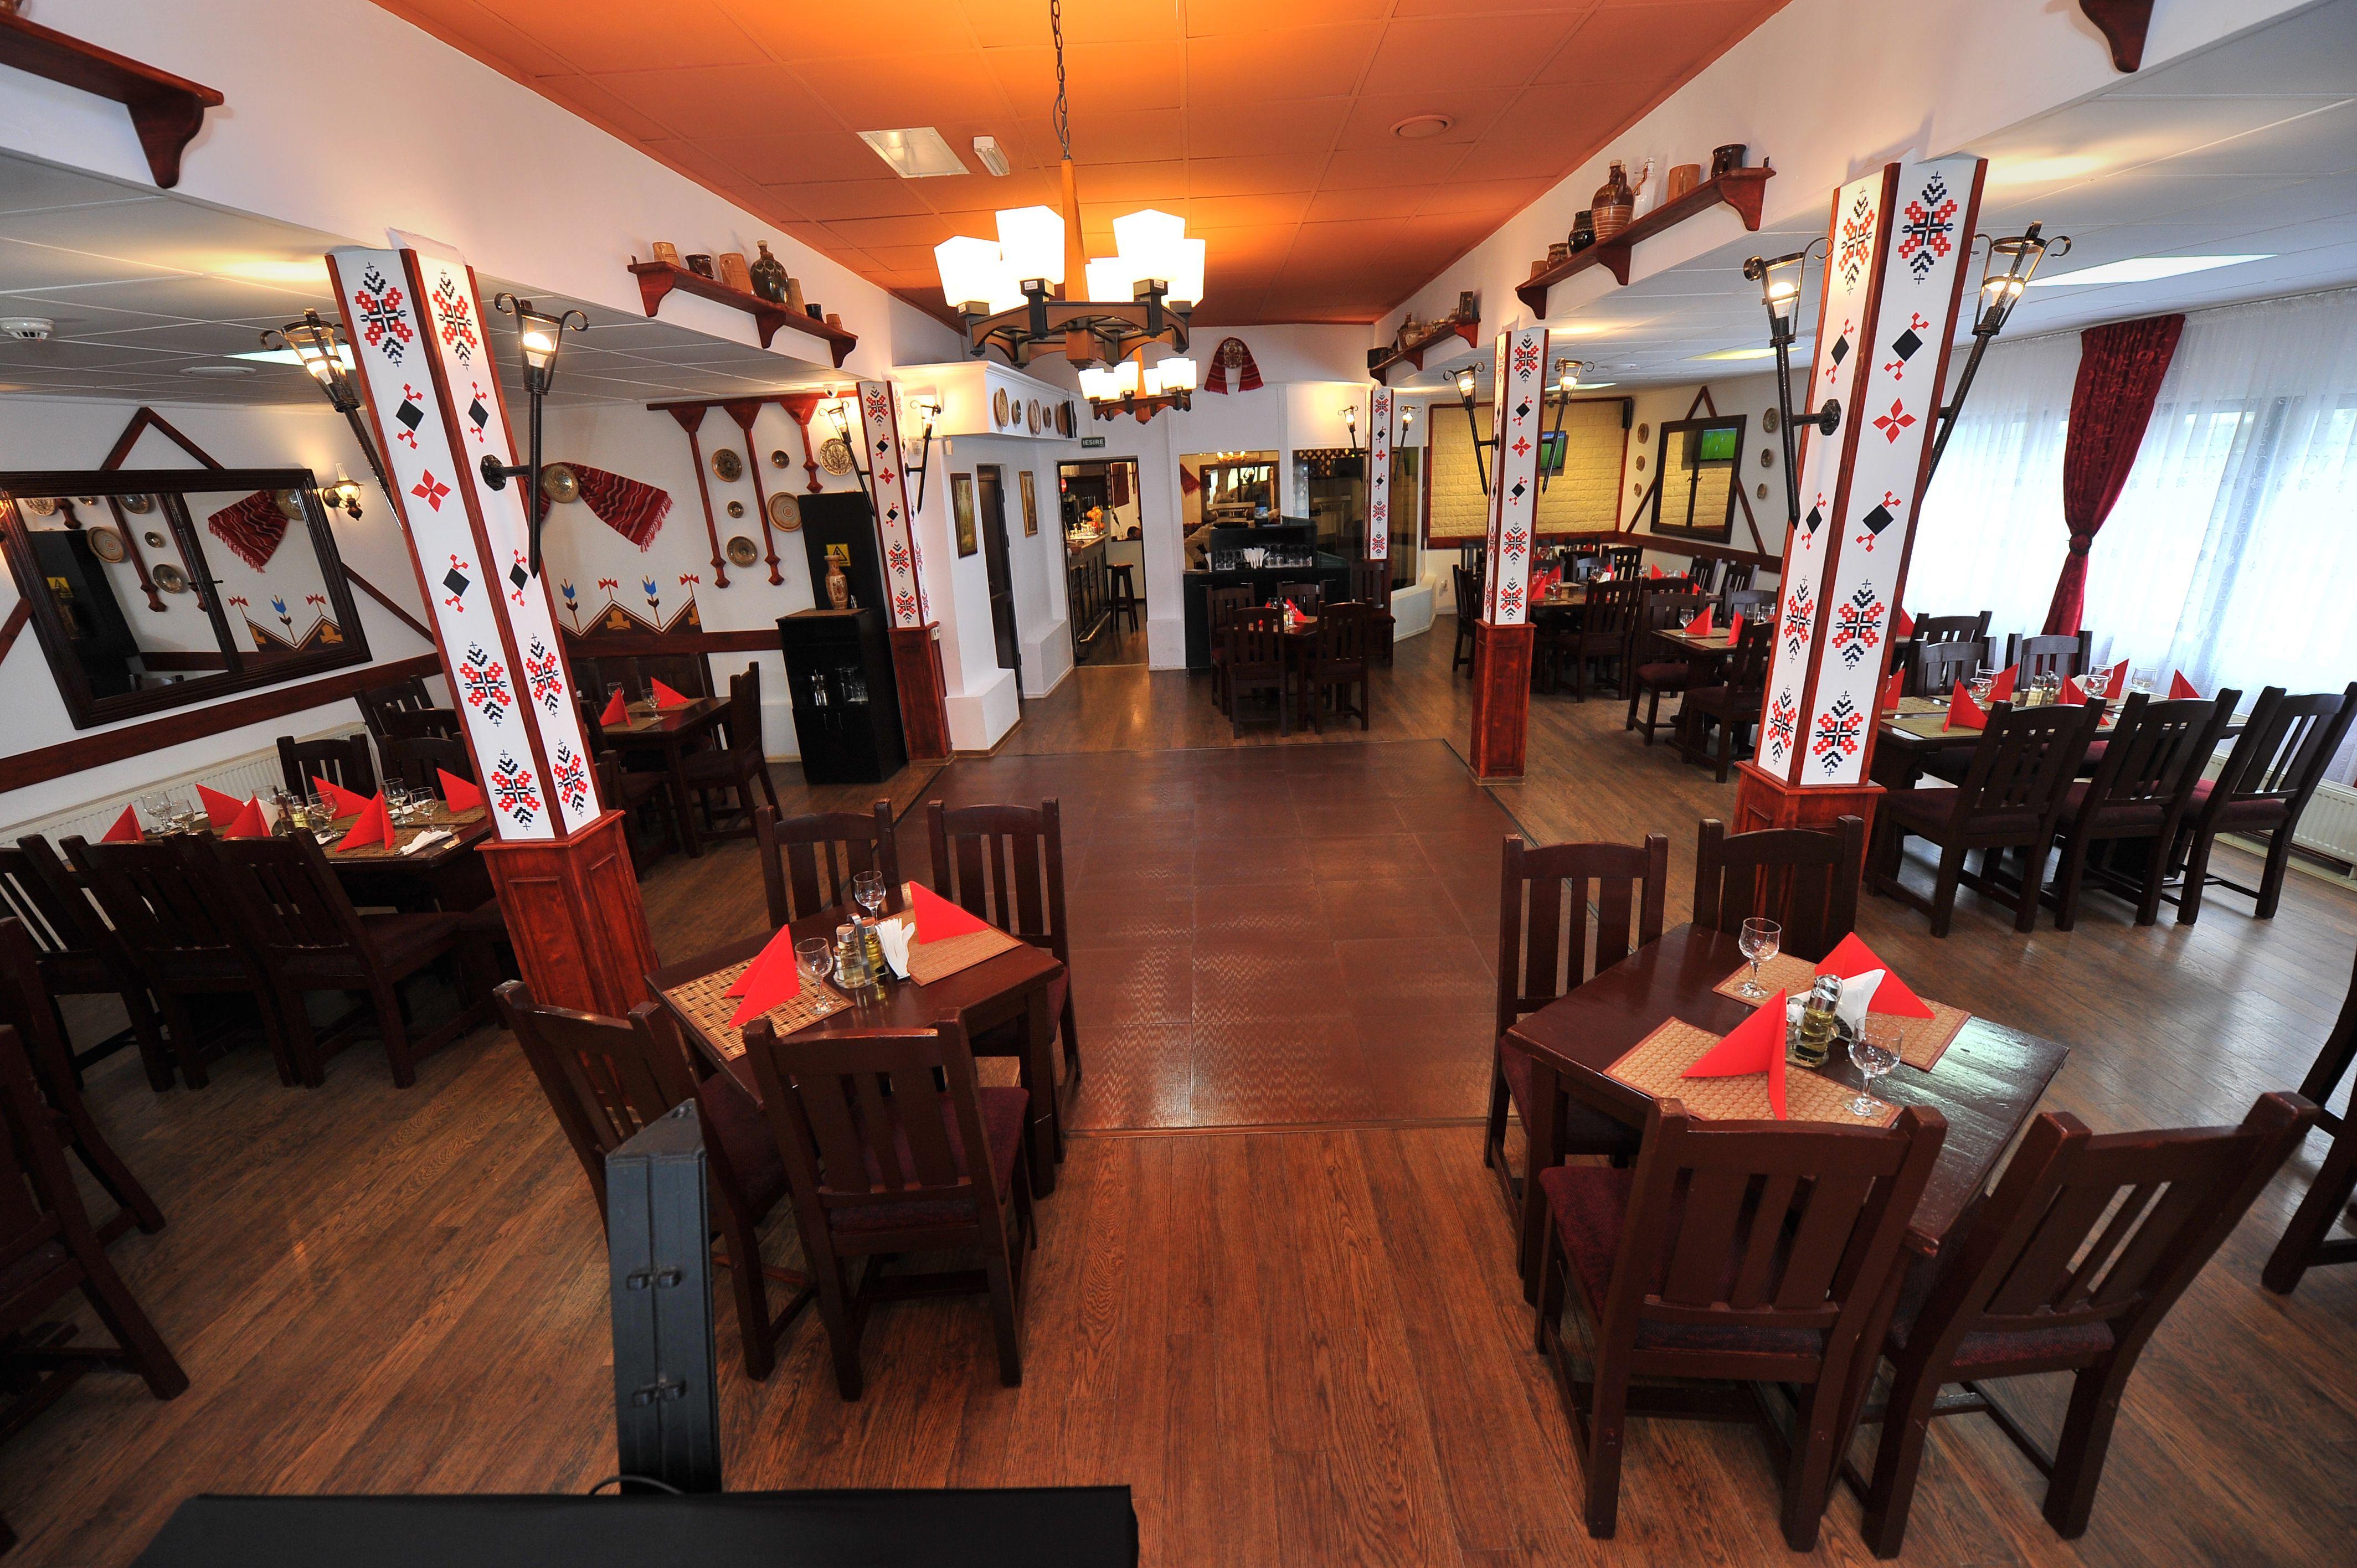 restaurant casa argeseana traditional pitesit galerie foto restaurant traditional casa. Black Bedroom Furniture Sets. Home Design Ideas